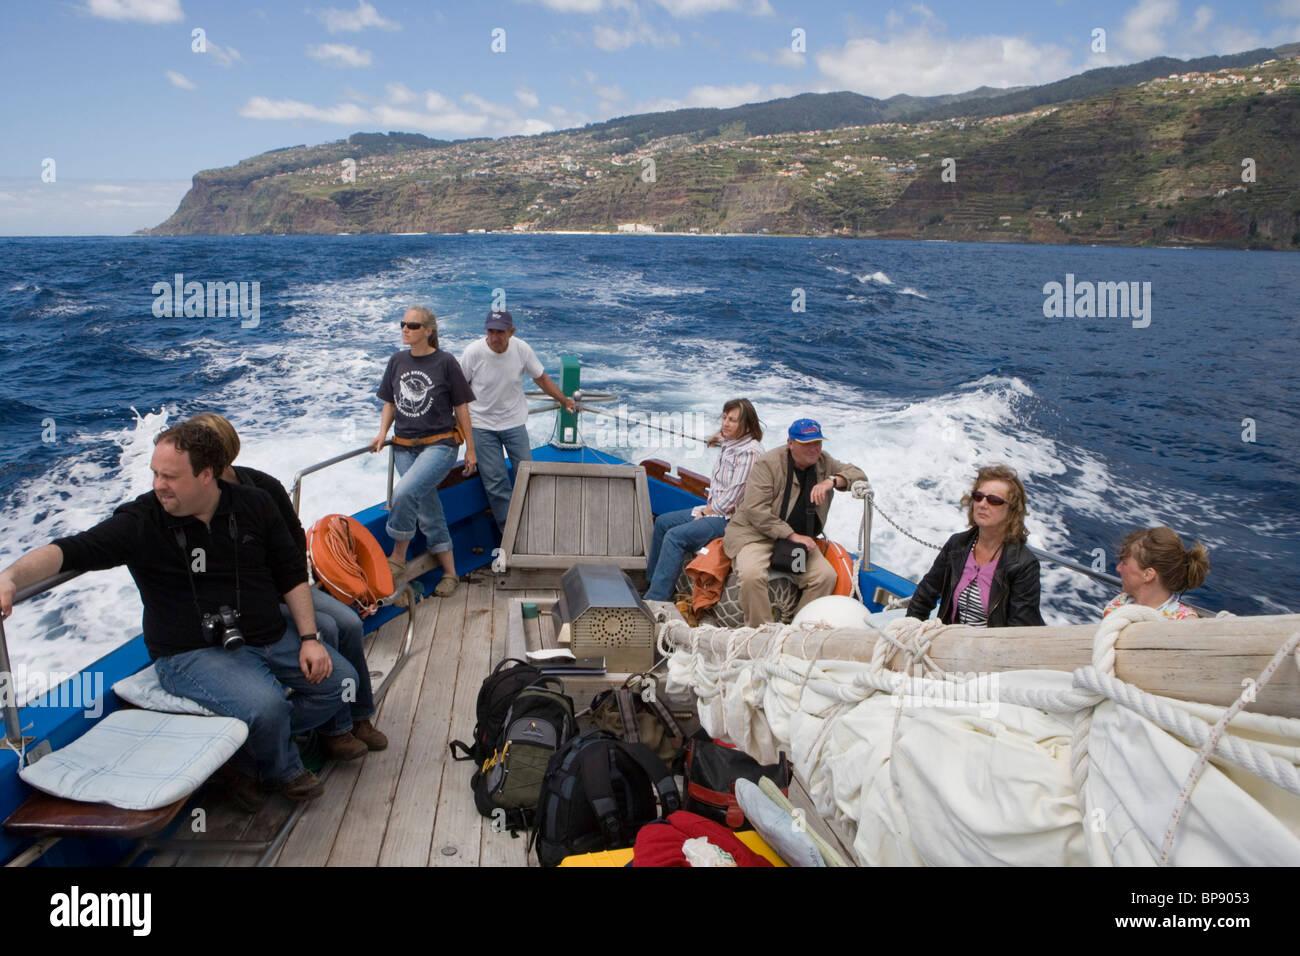 Aboard a whale watching boat Ribeira Brava, Near Calheta, Madeira, Portugal - Stock Image